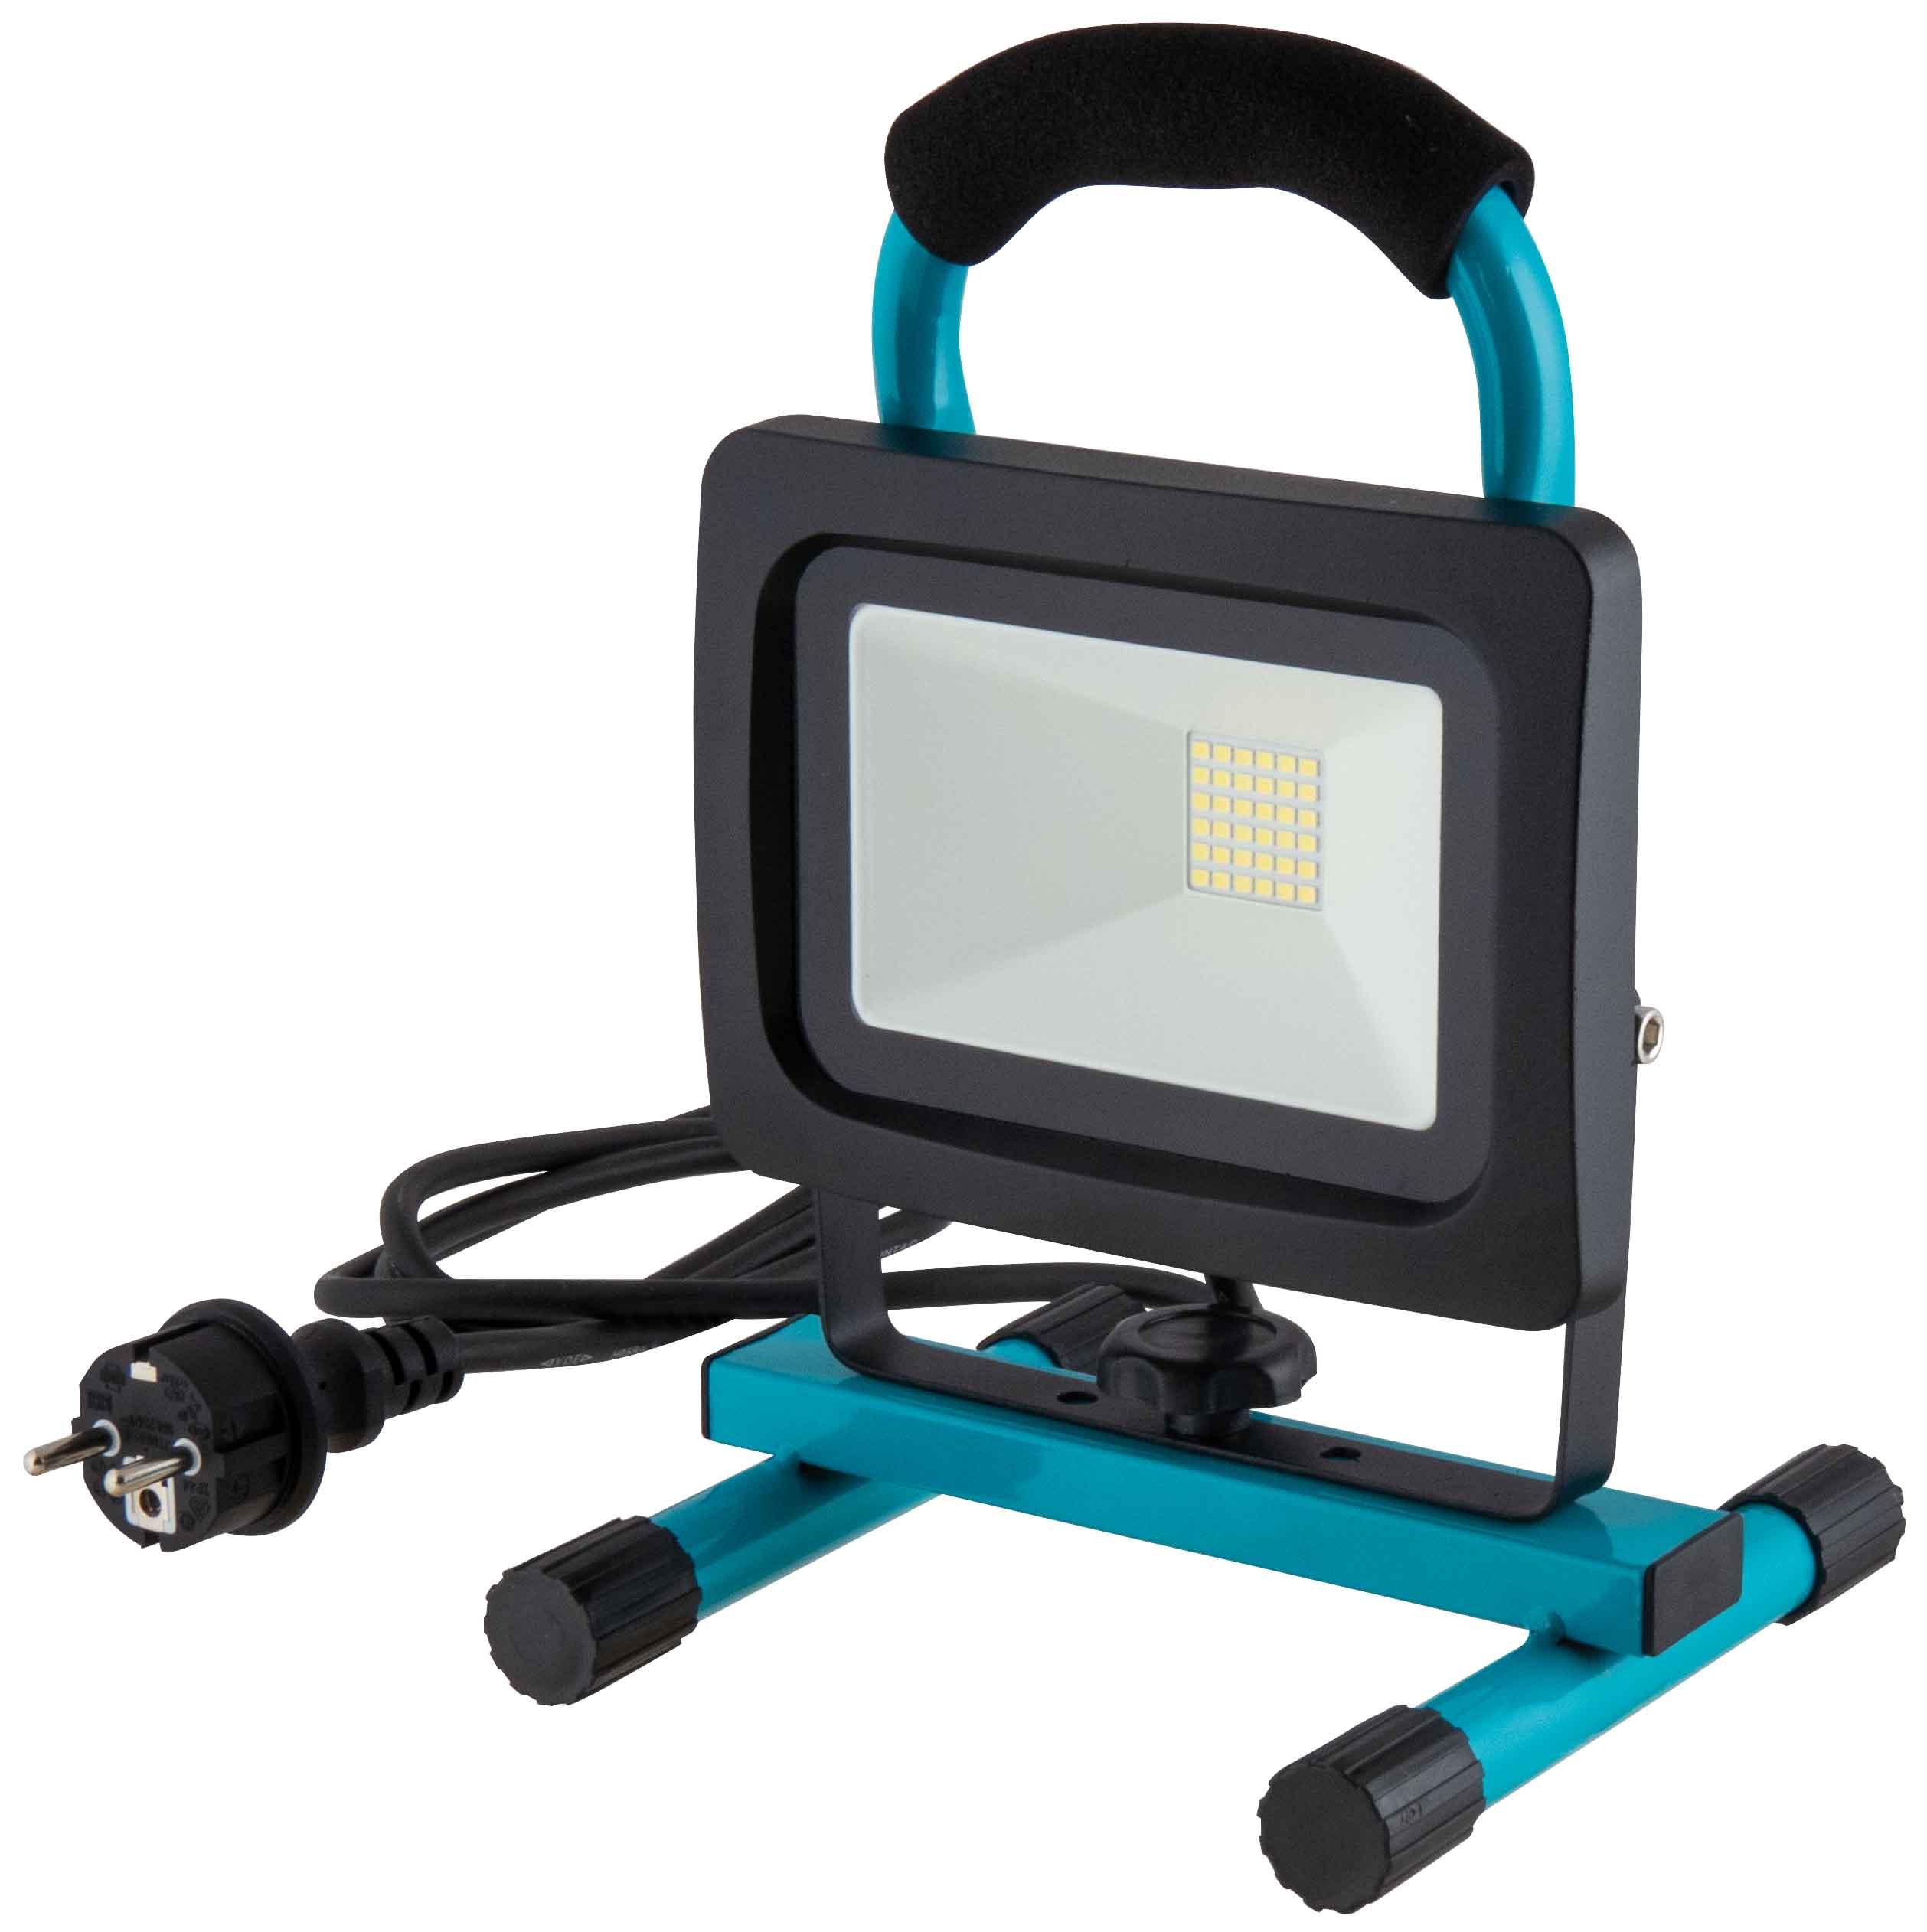 FARETTO A LED 30 WATT IP 65